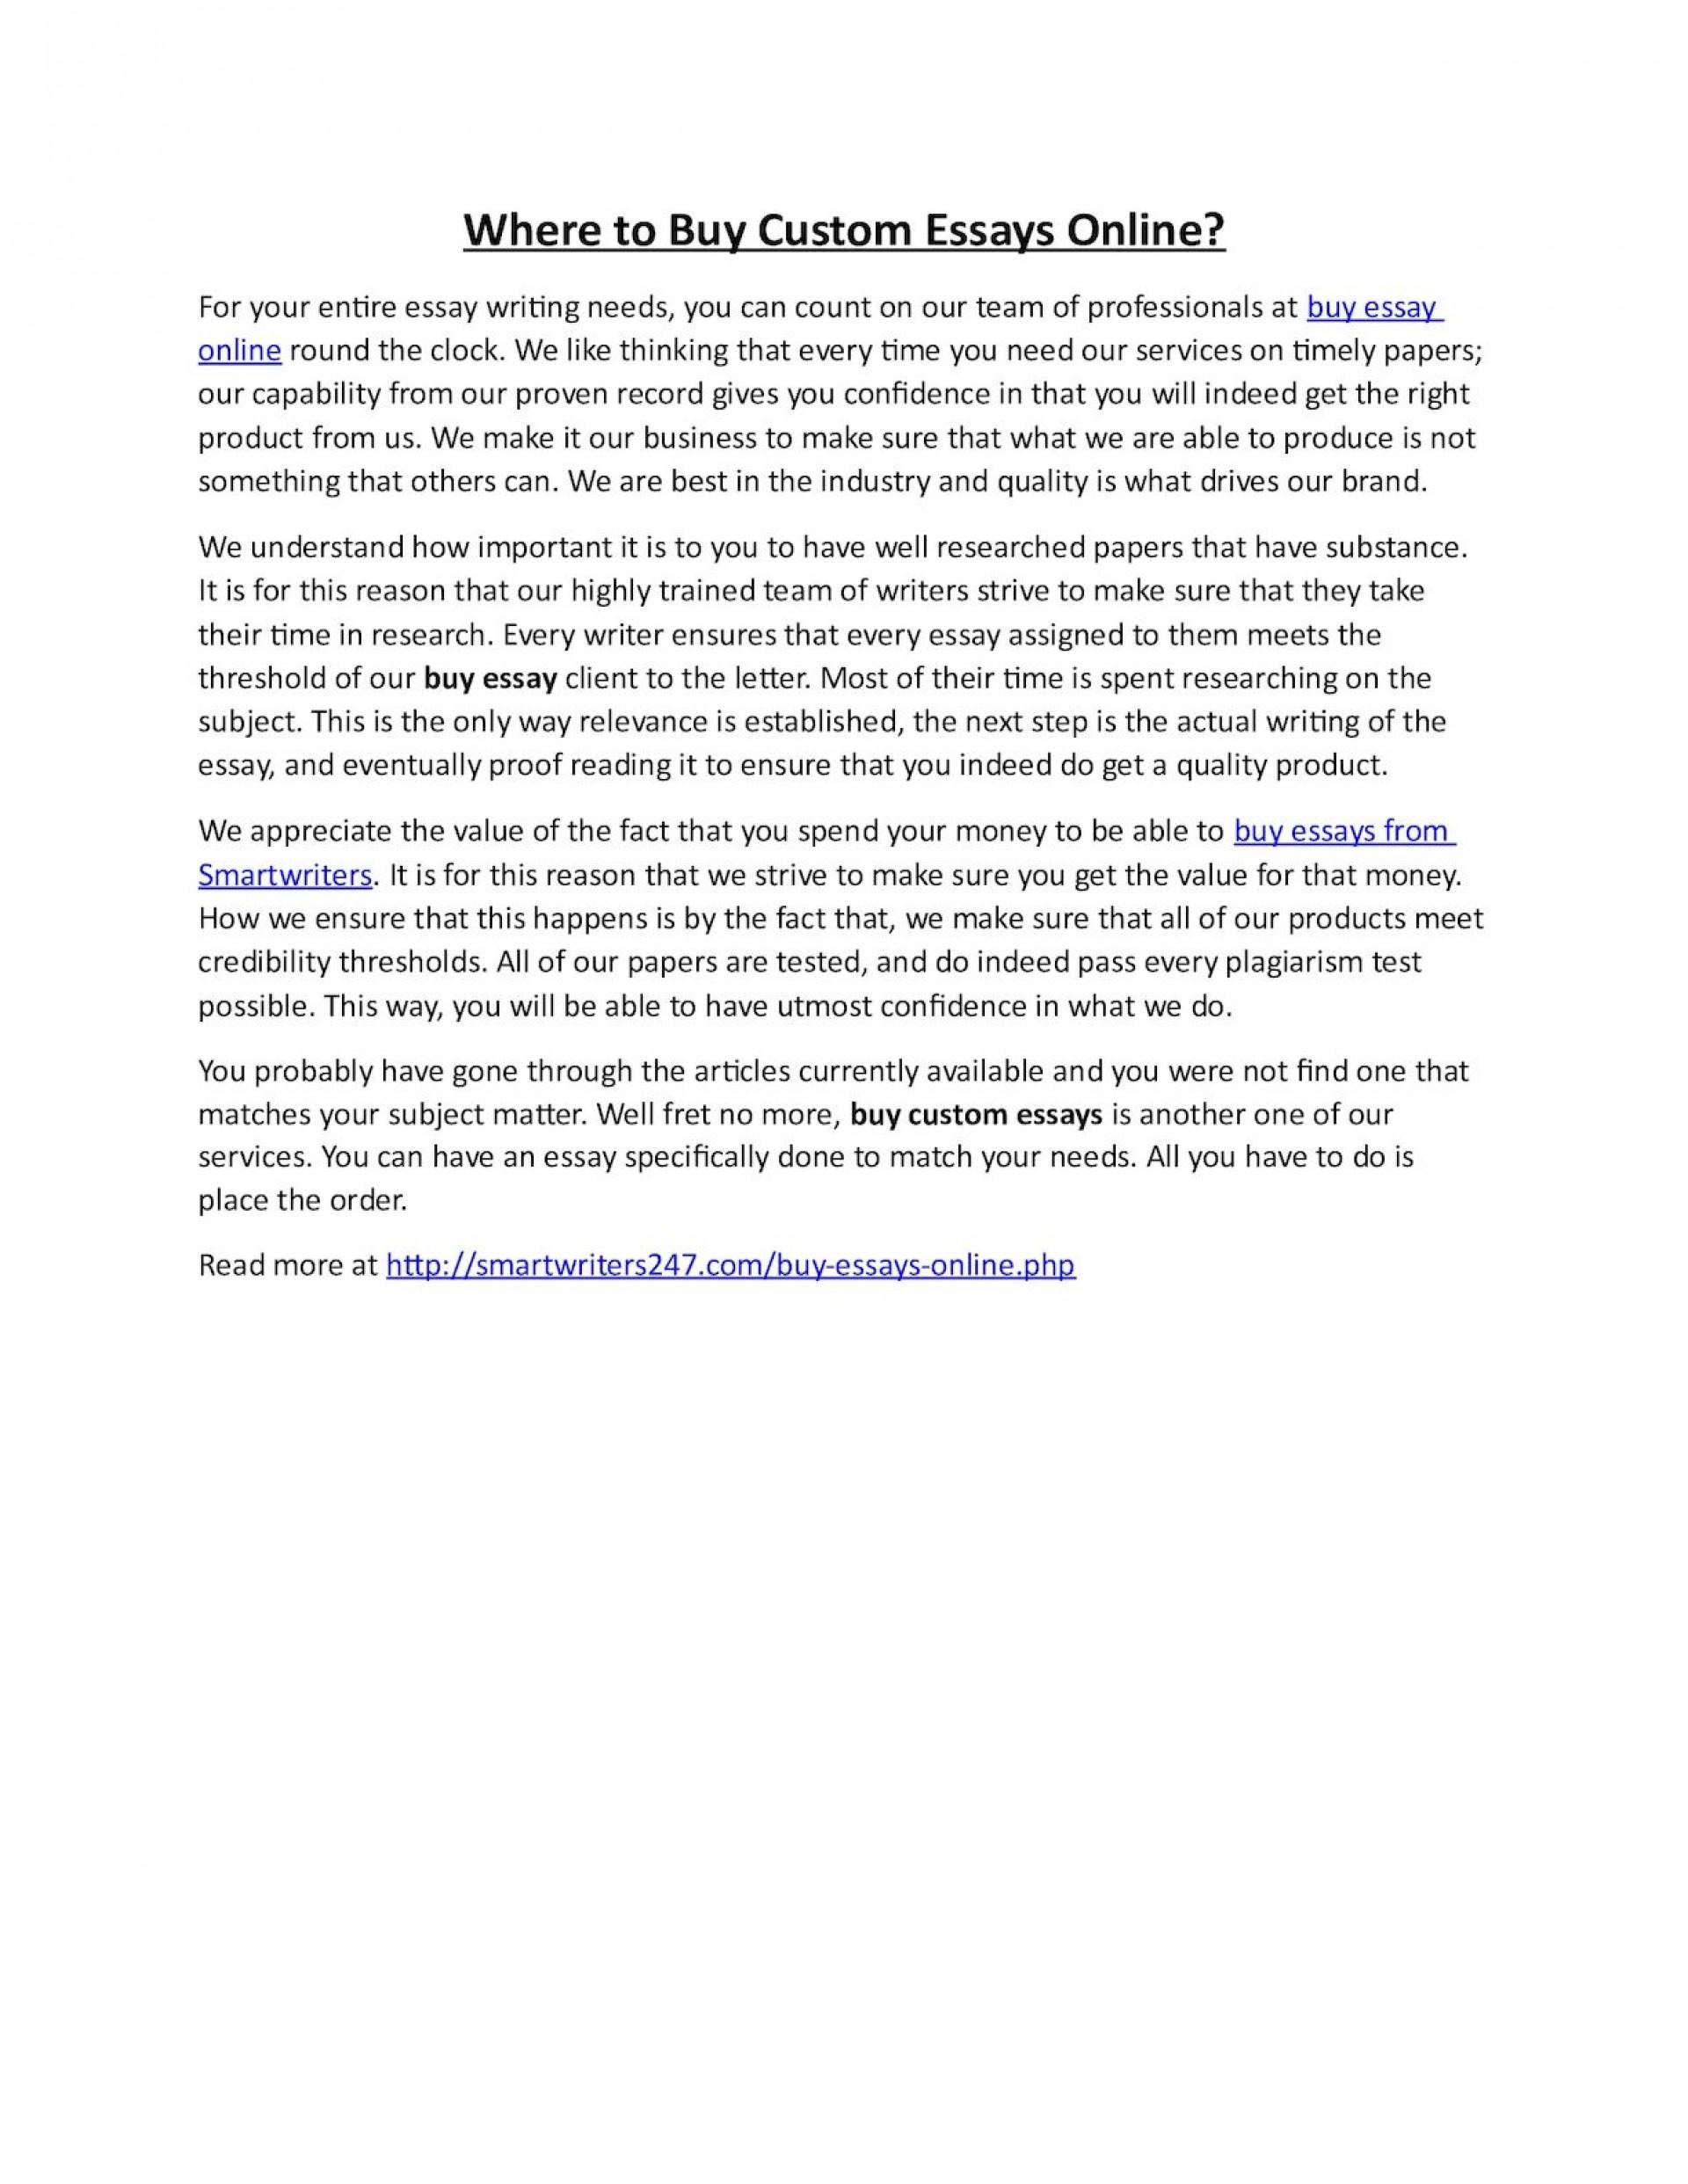 010 Essay Example P1 Buy Custom Essays Impressive Online 1920